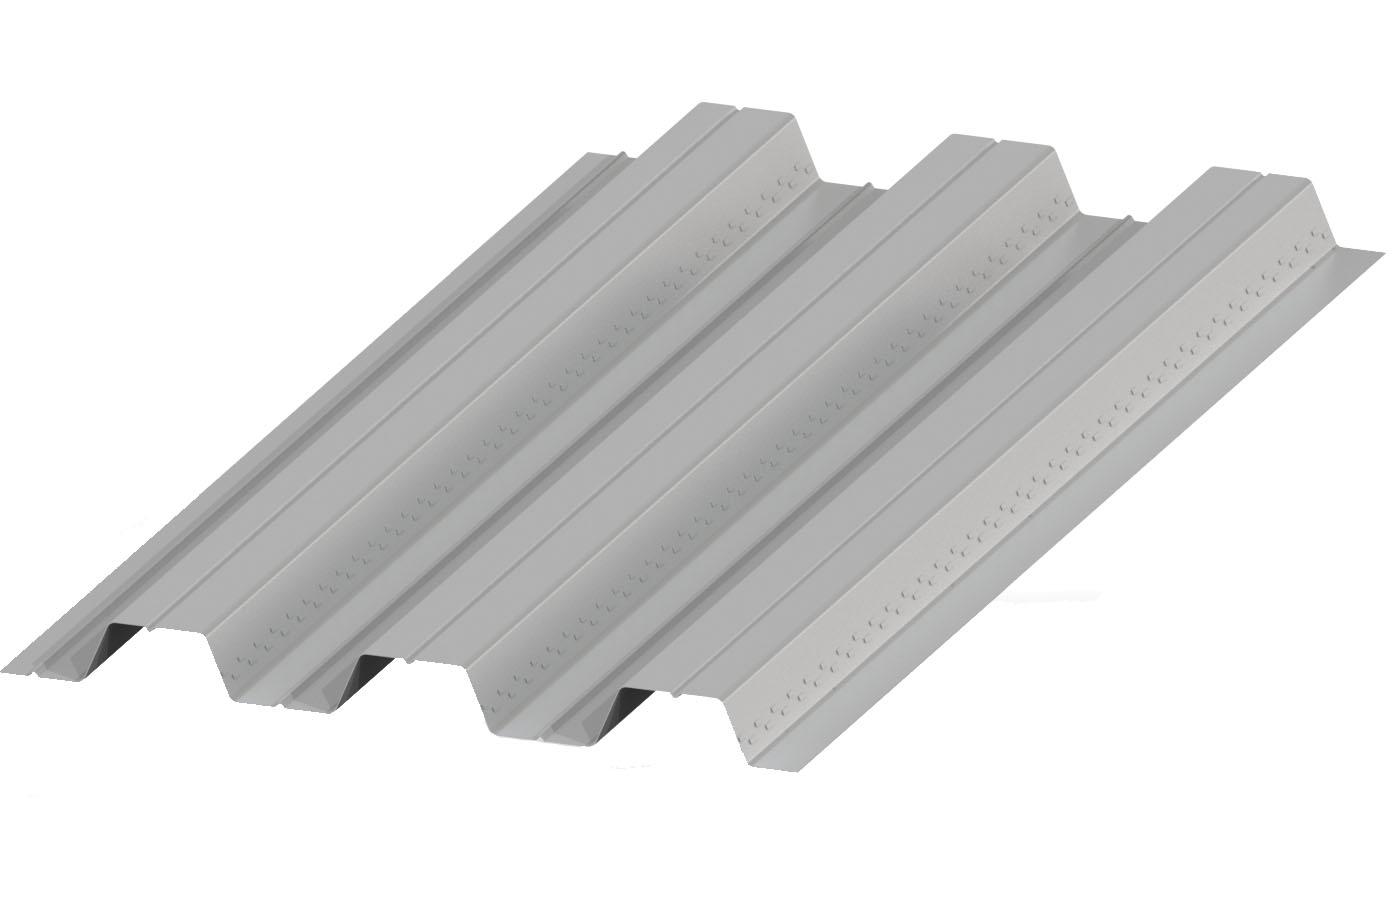 3.0 VLI Composite Deck